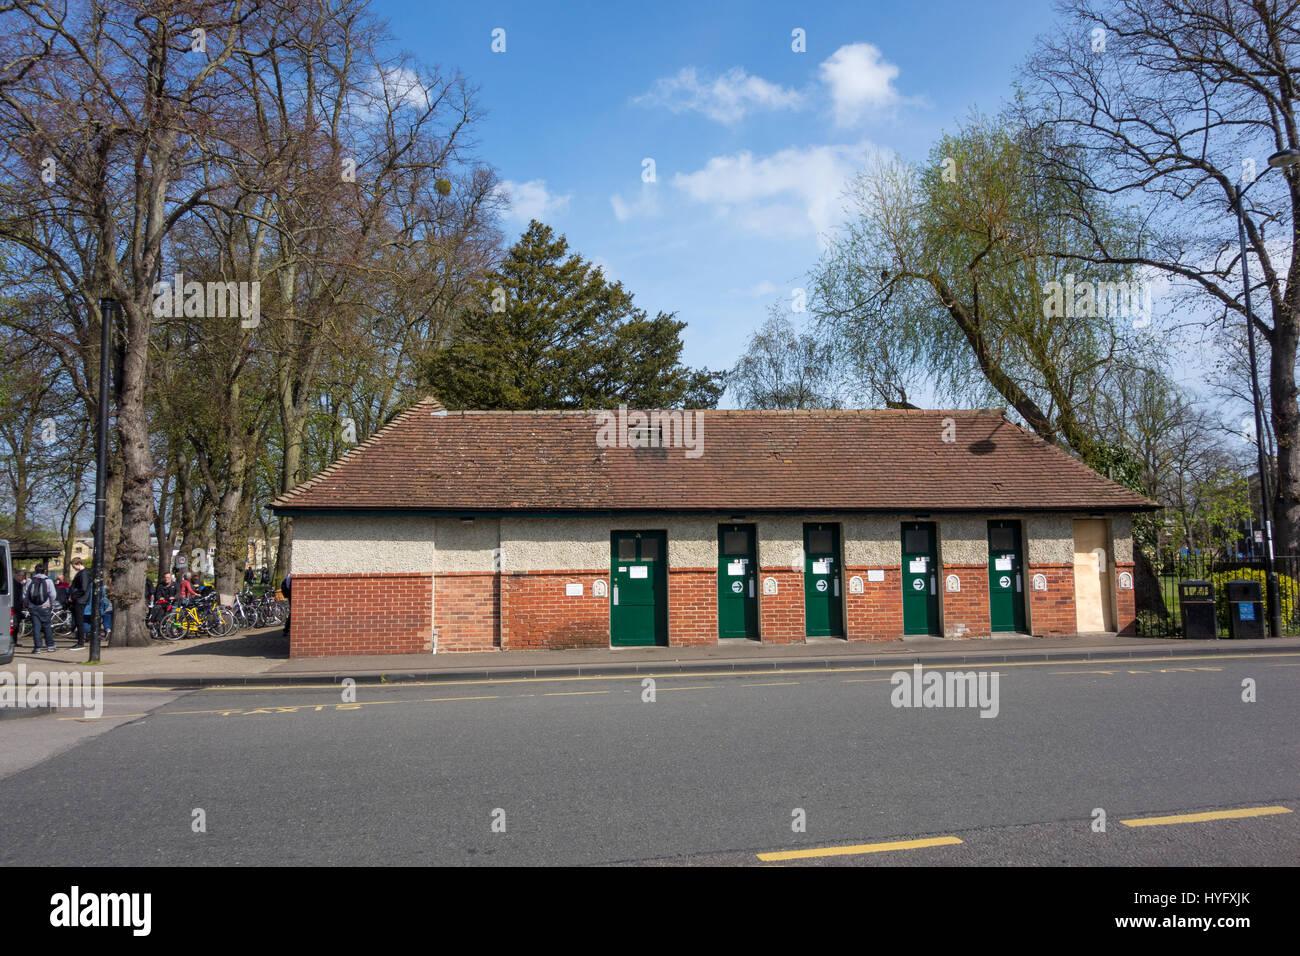 toilet-block-drummer-street-near-cambridge-centre-bus-station-HYFXJK.jpg